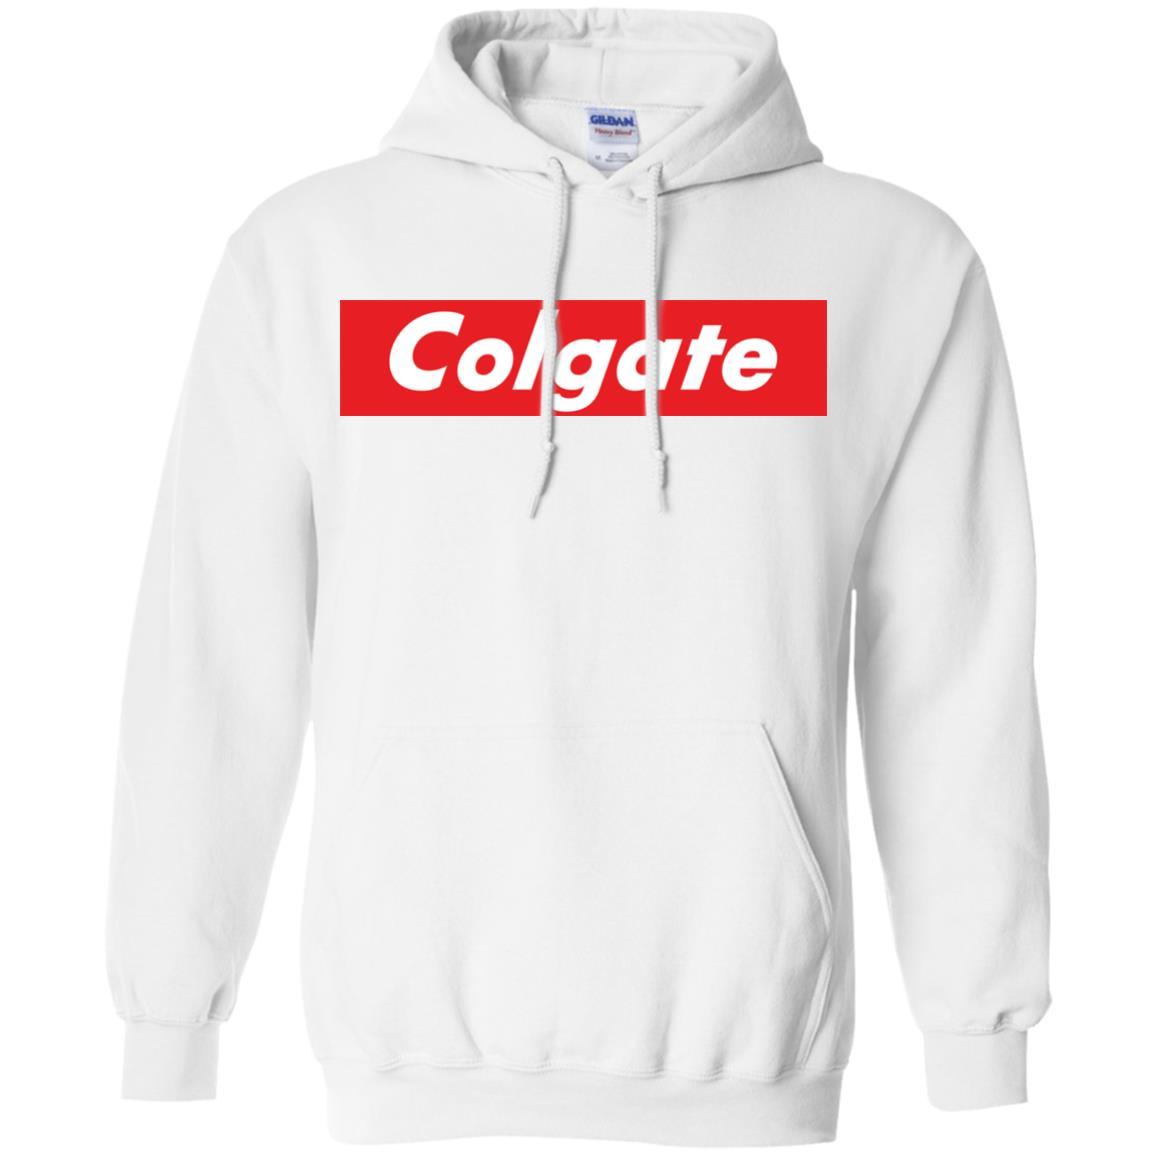 image 993px Supreme Colgate Shirt, Hoodies, Tank